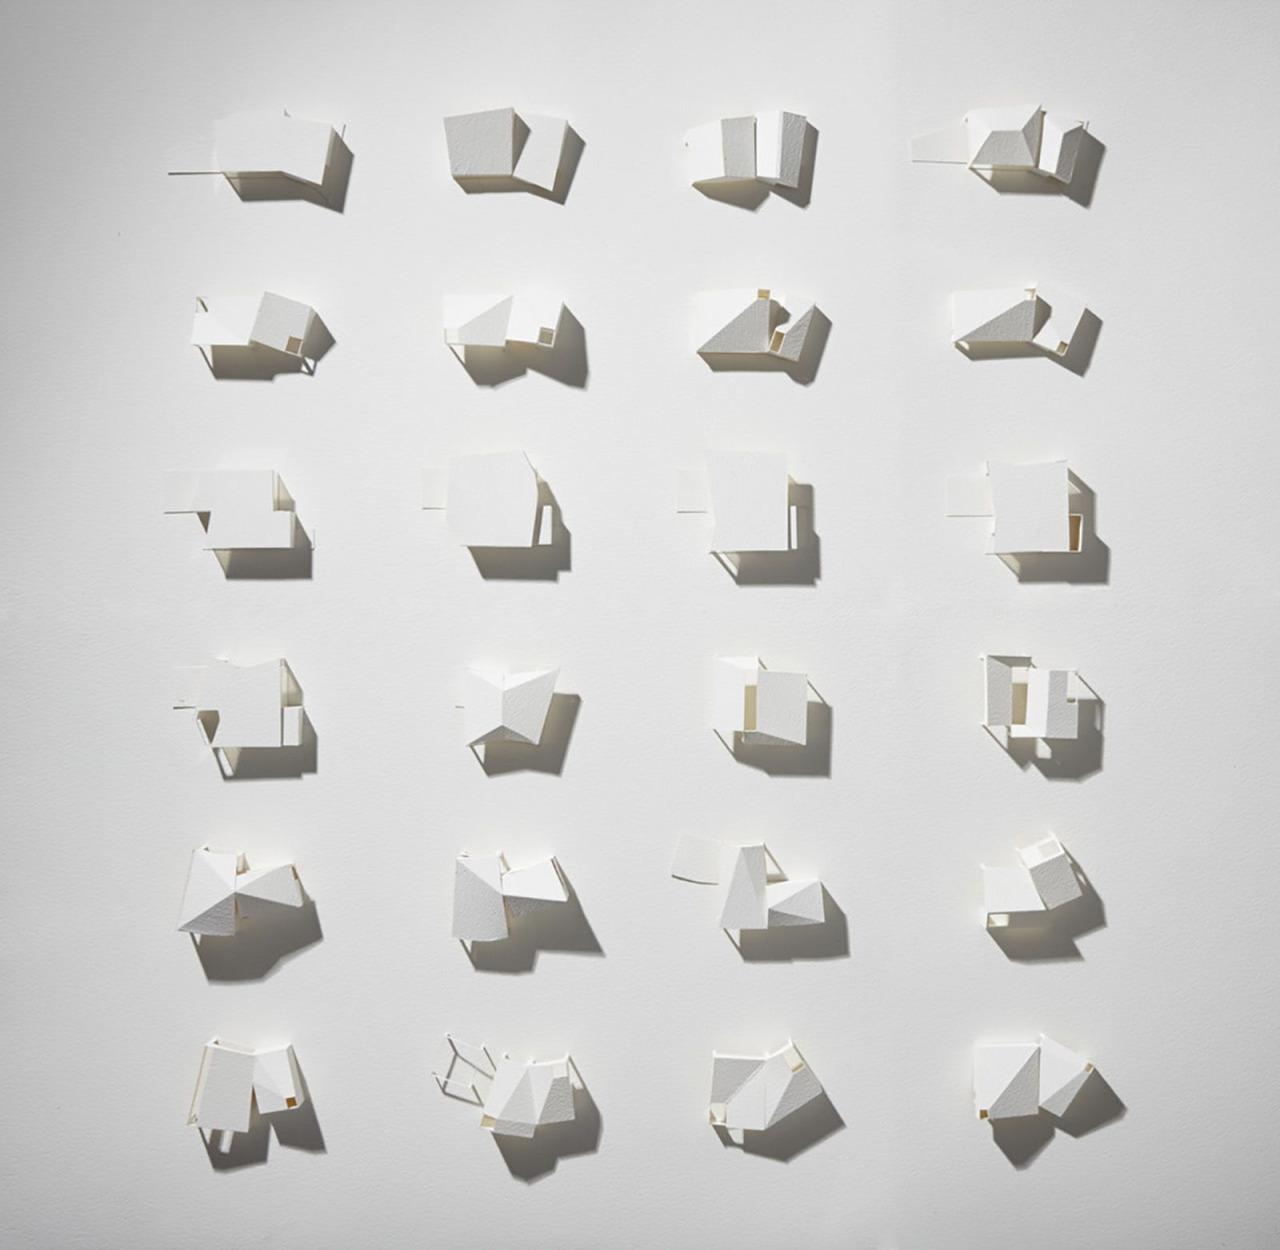 Duggan Morris Architects, Finsbury Circus (fonte: modelarchitecture.tumblr.com)